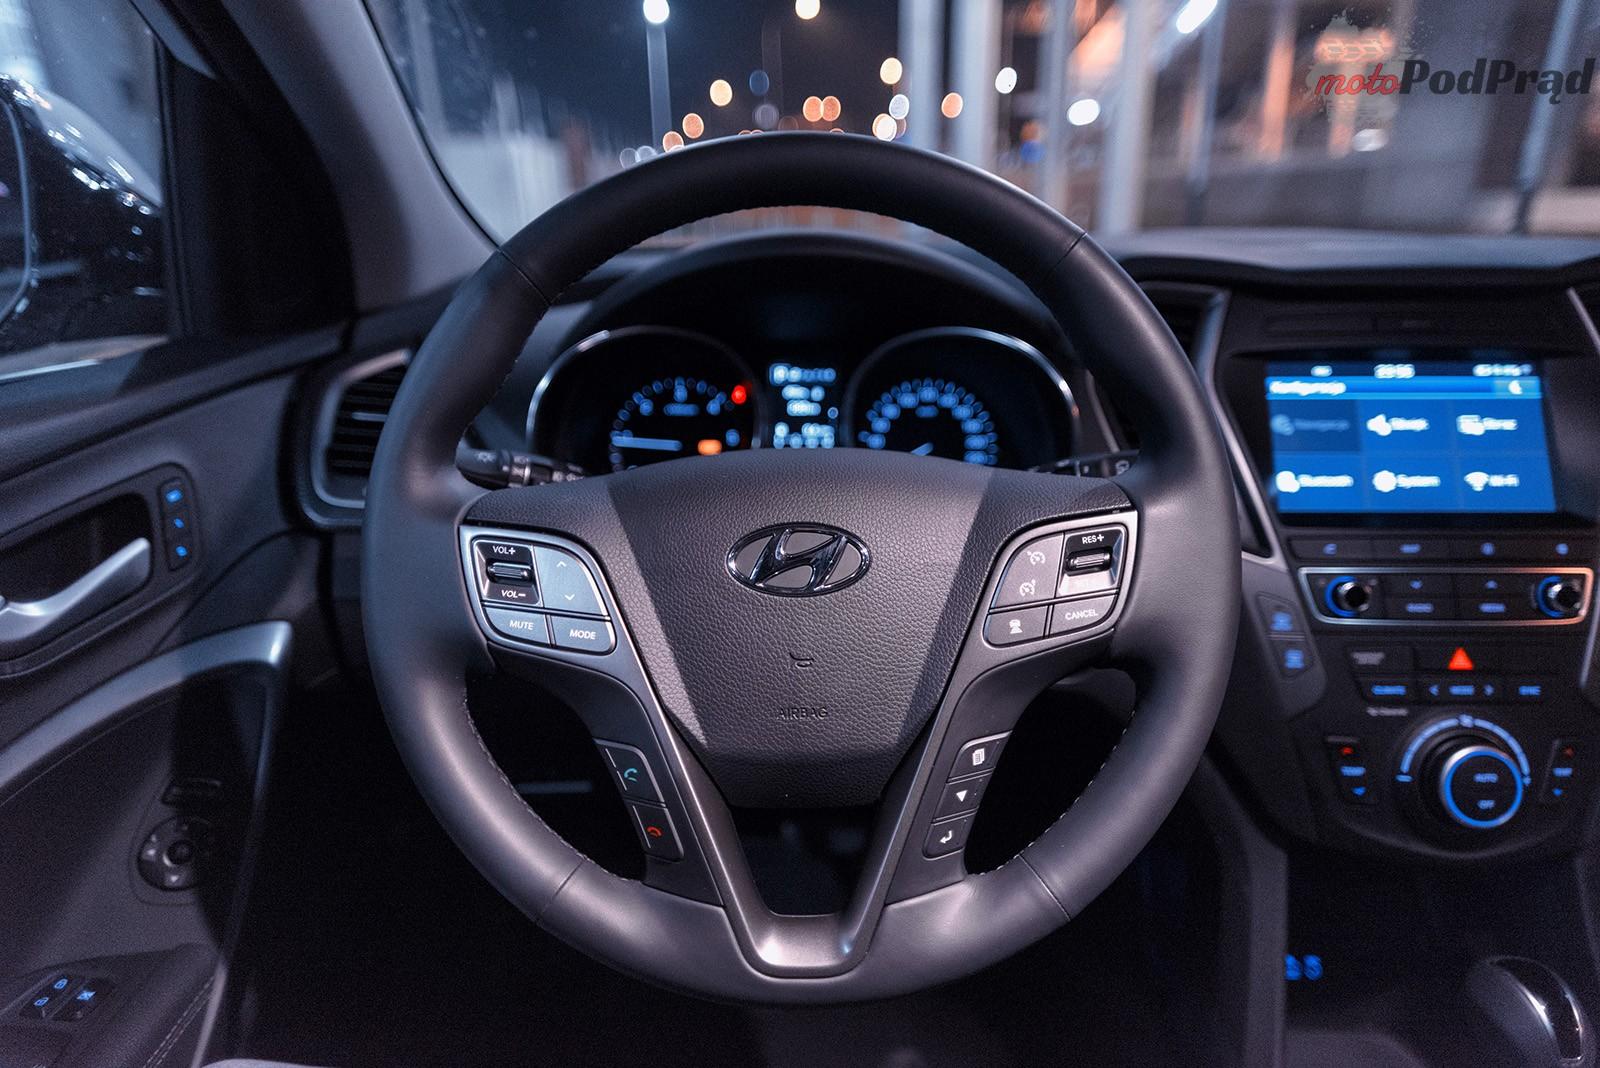 Hyundai Santa Fe 9 Test: Hyundai Santa Fe 2.2 CRDi 200 KM   wczasy na kołach